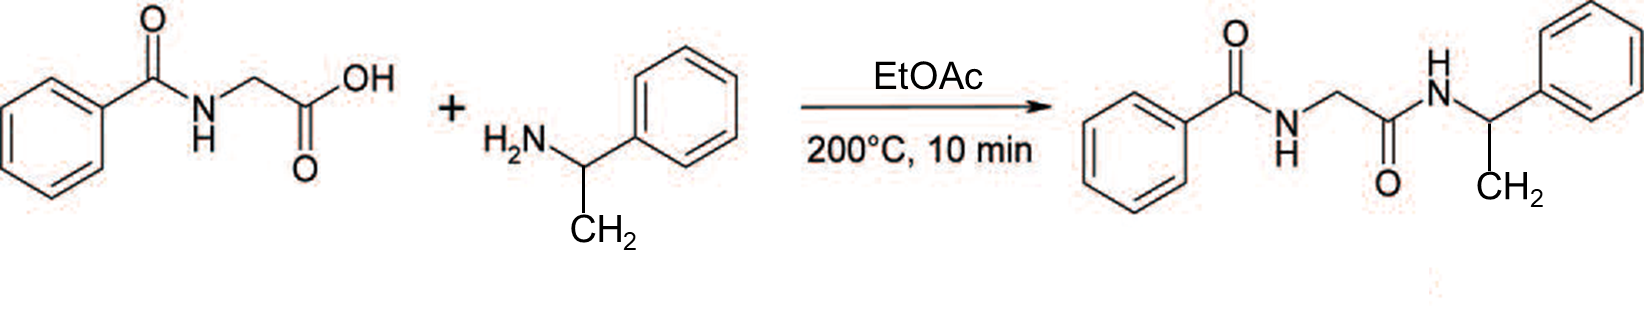 Hipp acid + aMBA RxN in EtOAc-1